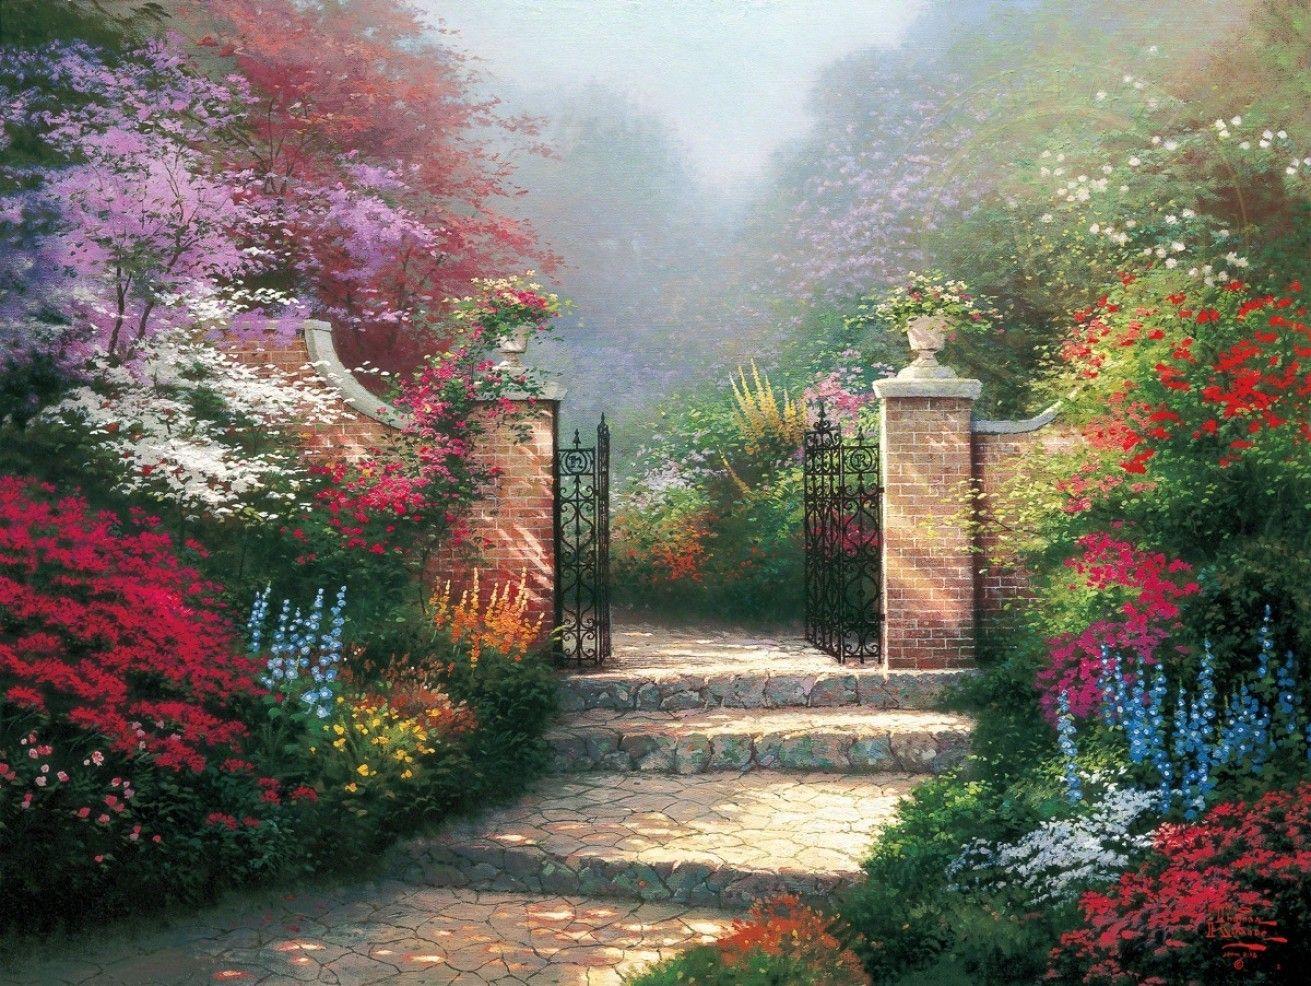 The Victorian Garden Victorian Gardens Kinkade Paintings